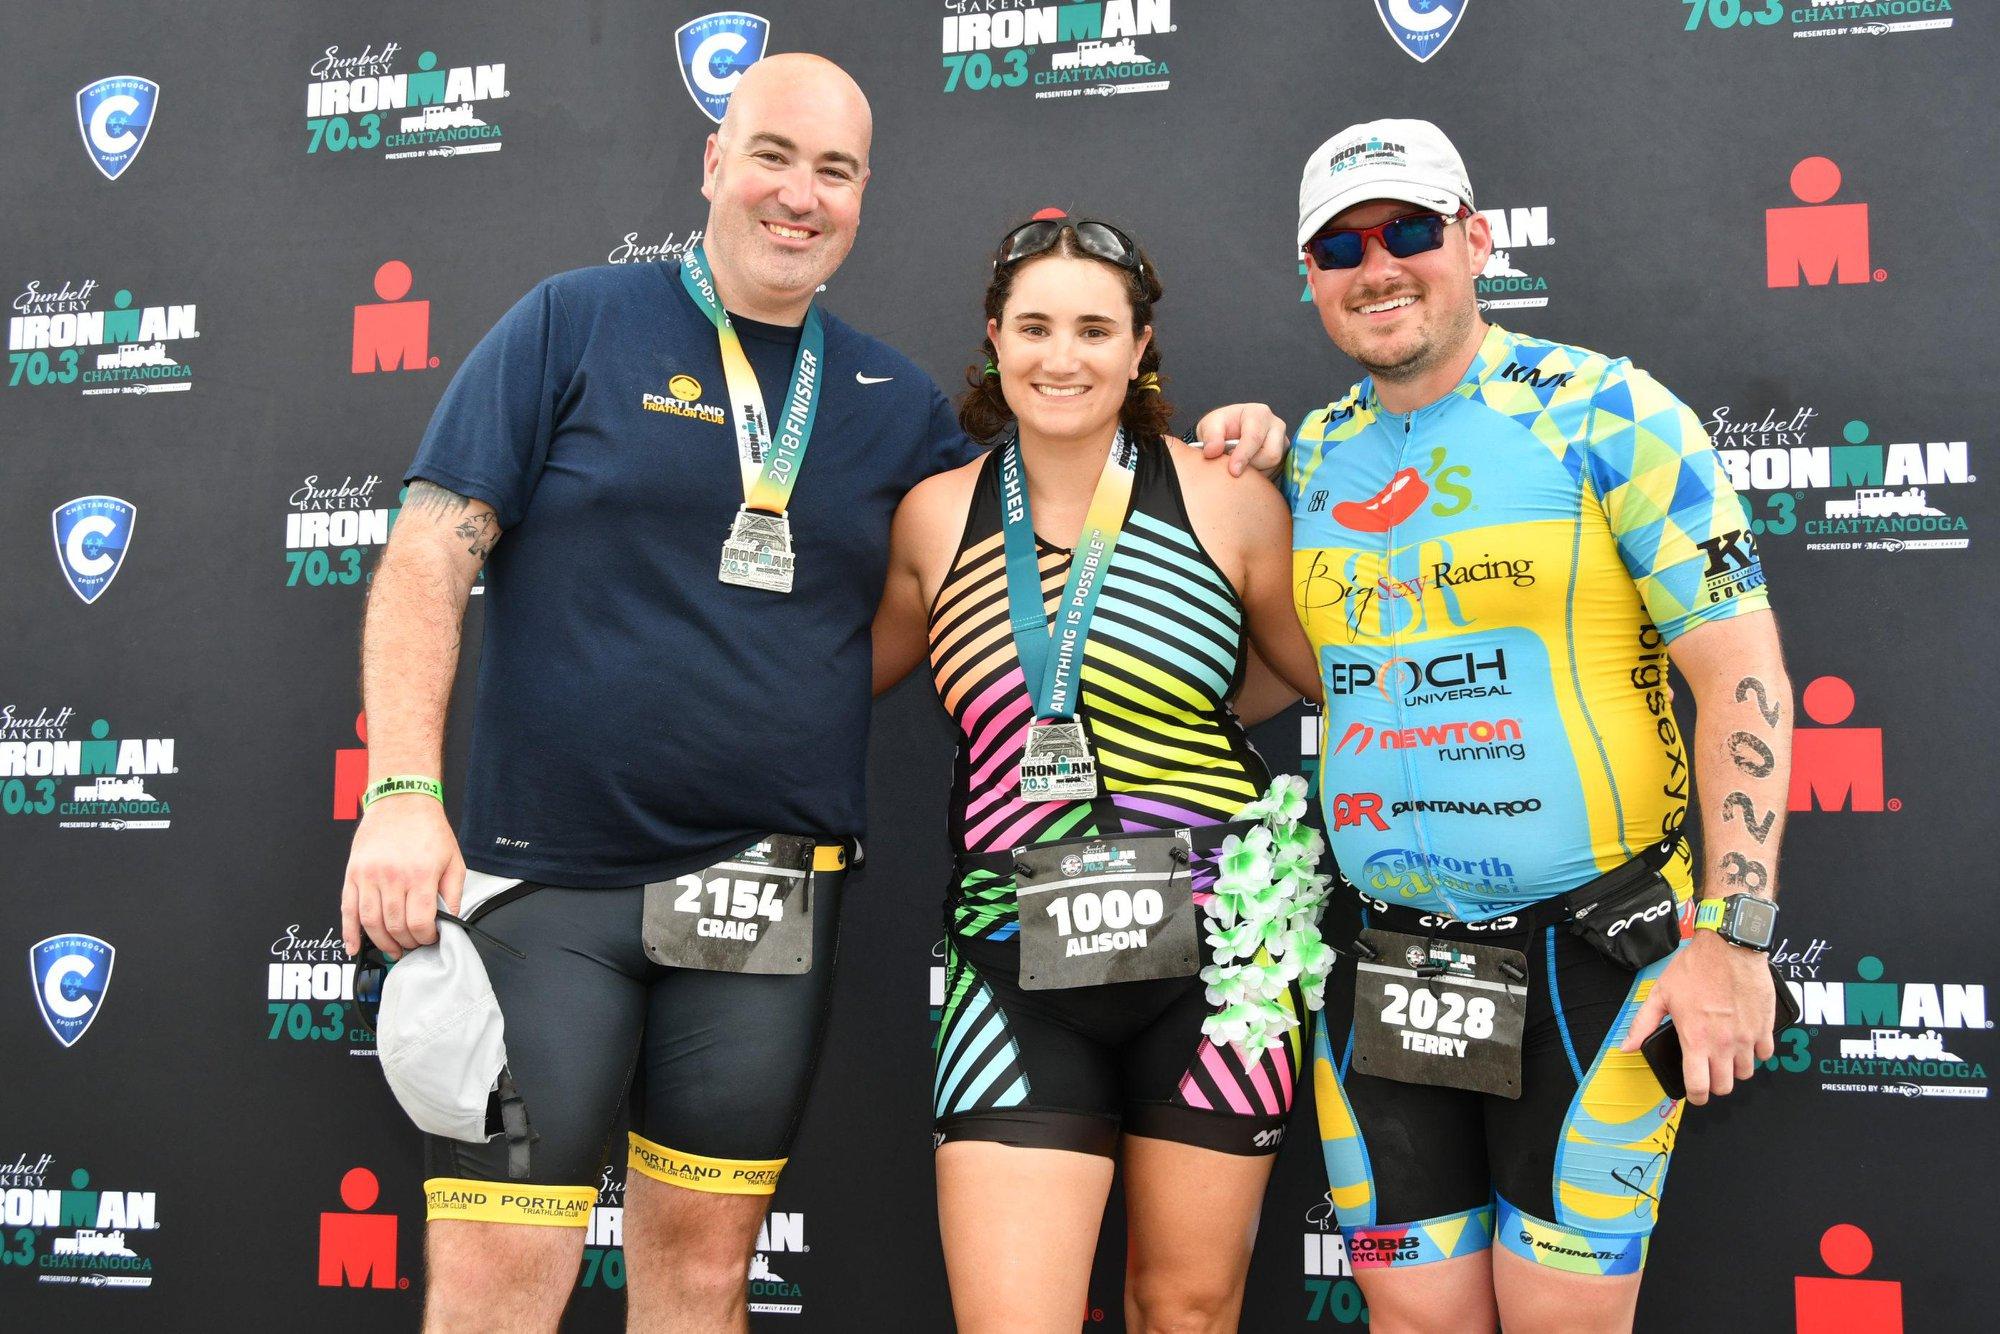 Coach_Terry_Wilson_Ali_Hooker_Ironman_Chattanooga_70.3_Medal_Finish.jpg